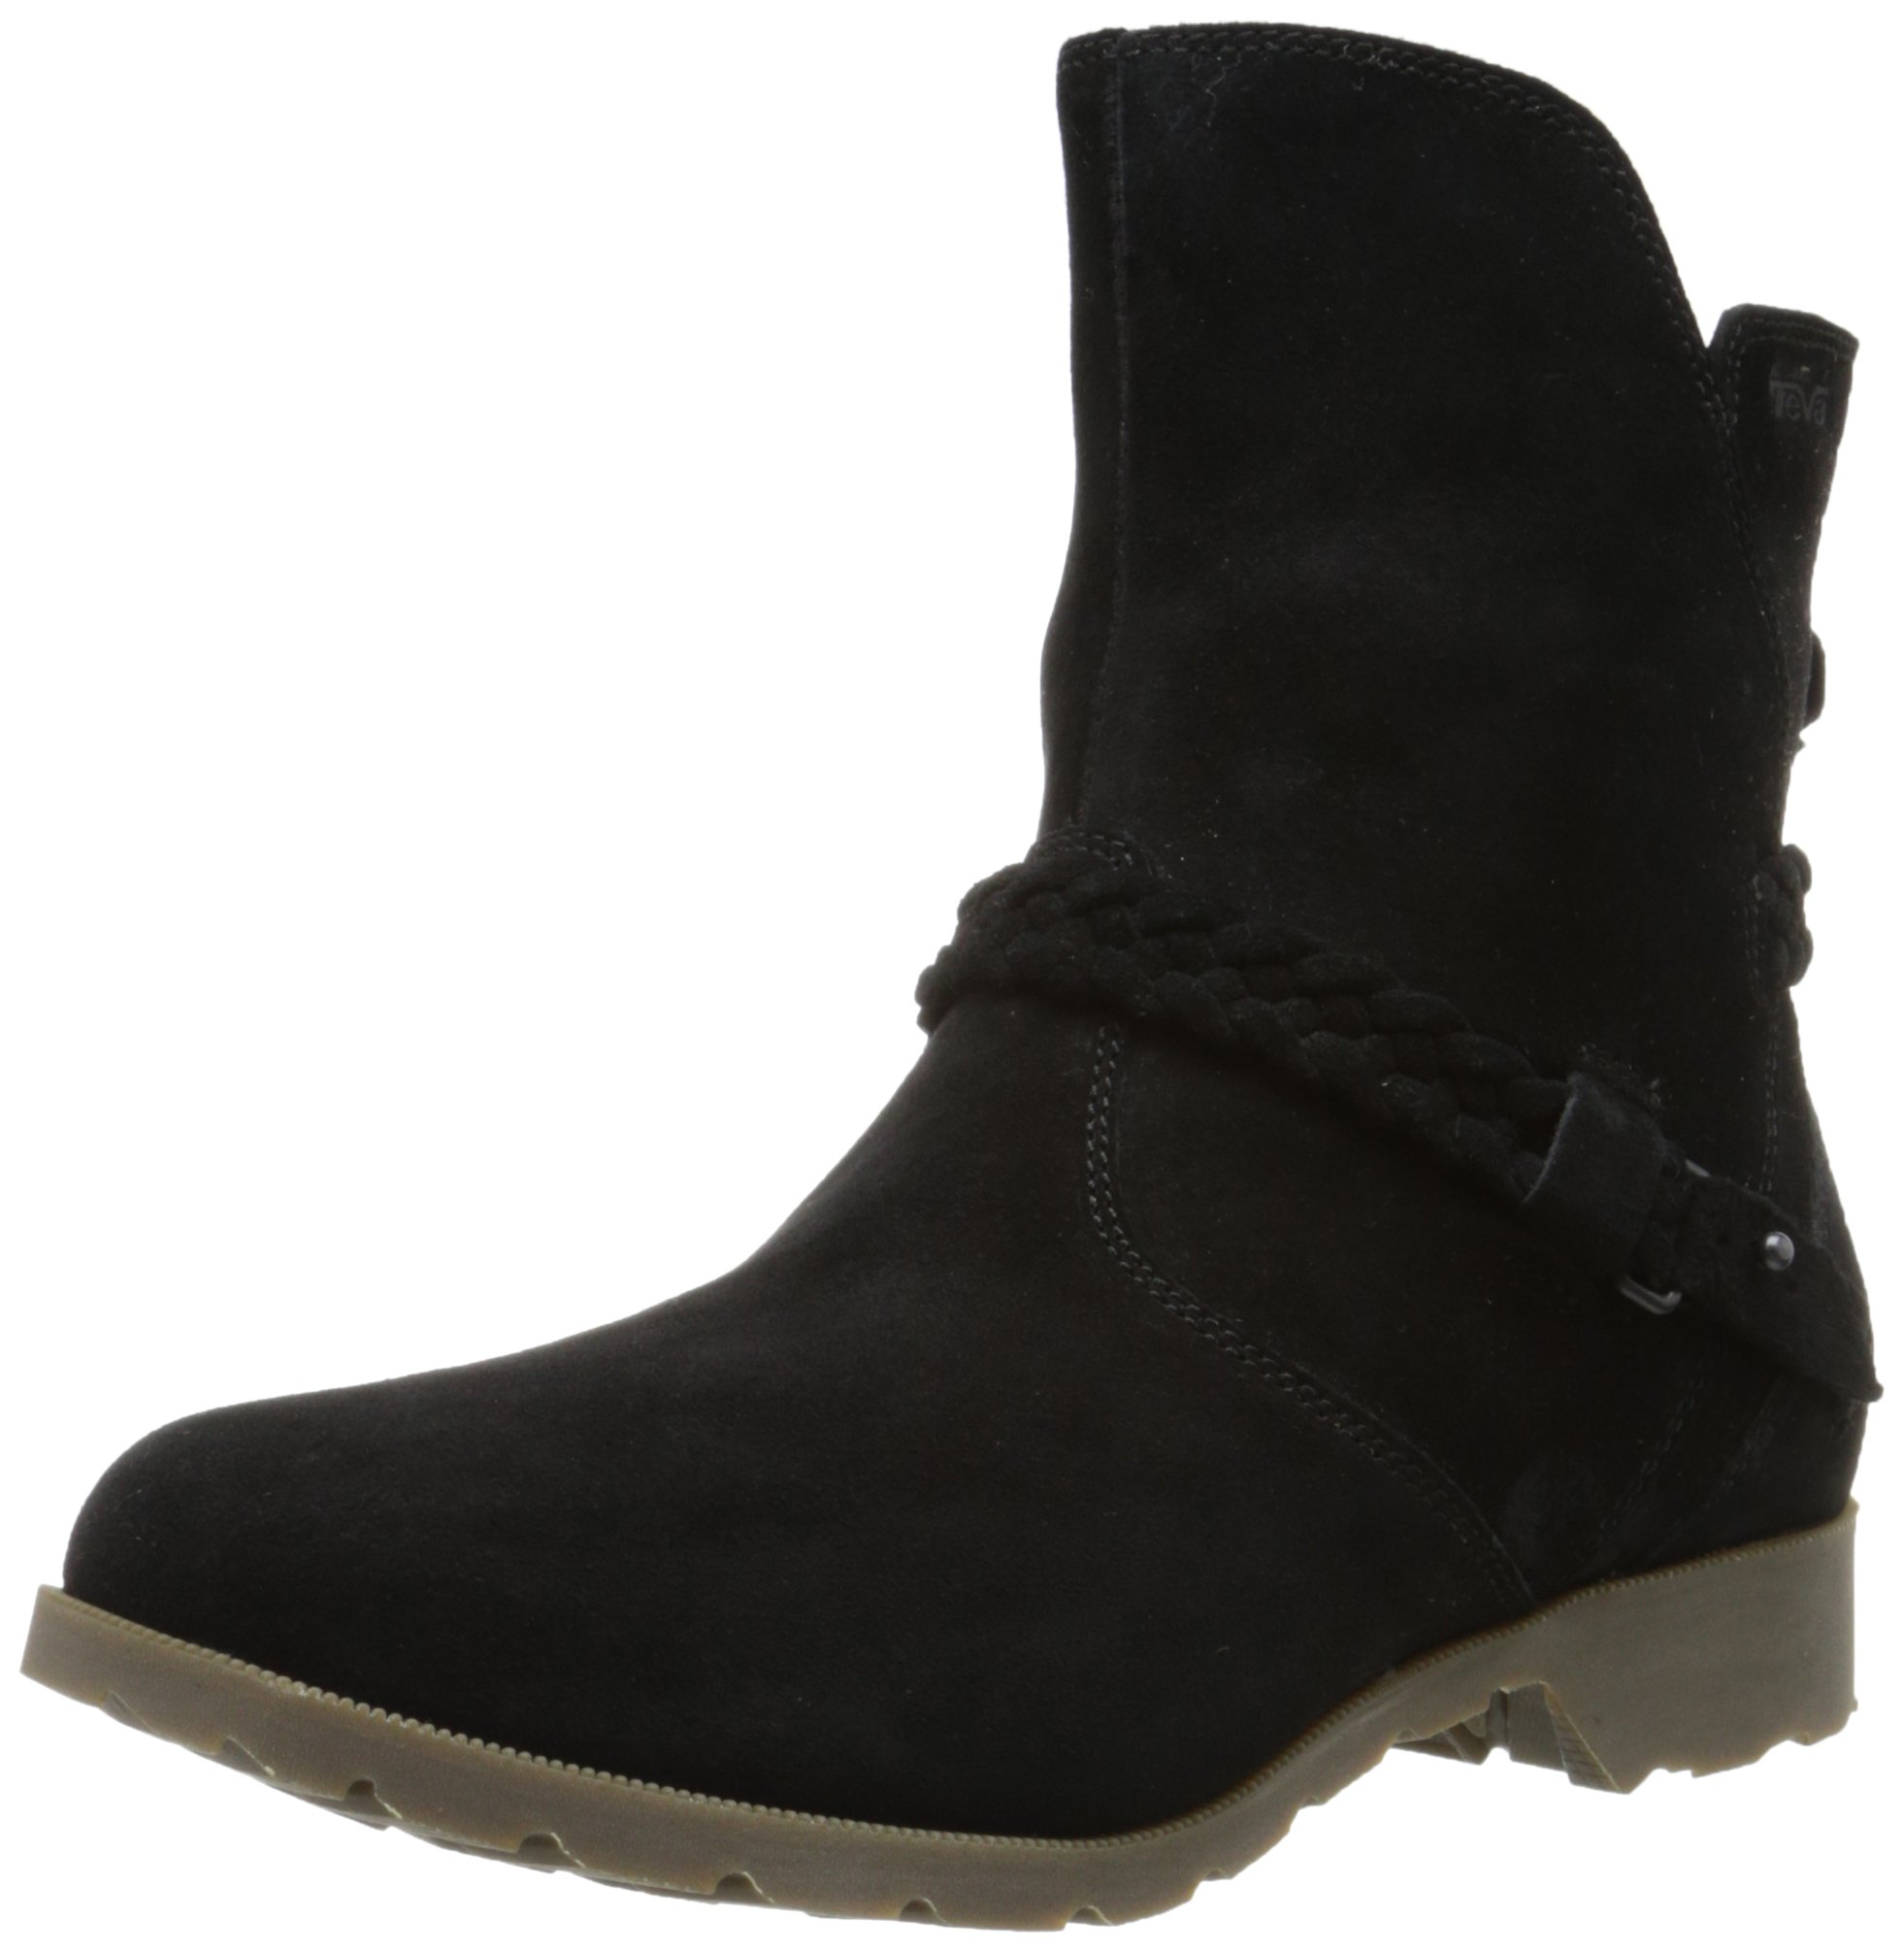 Teva Women's W Delavina Low Suede Mid Calf Boot, Black, 8 M US